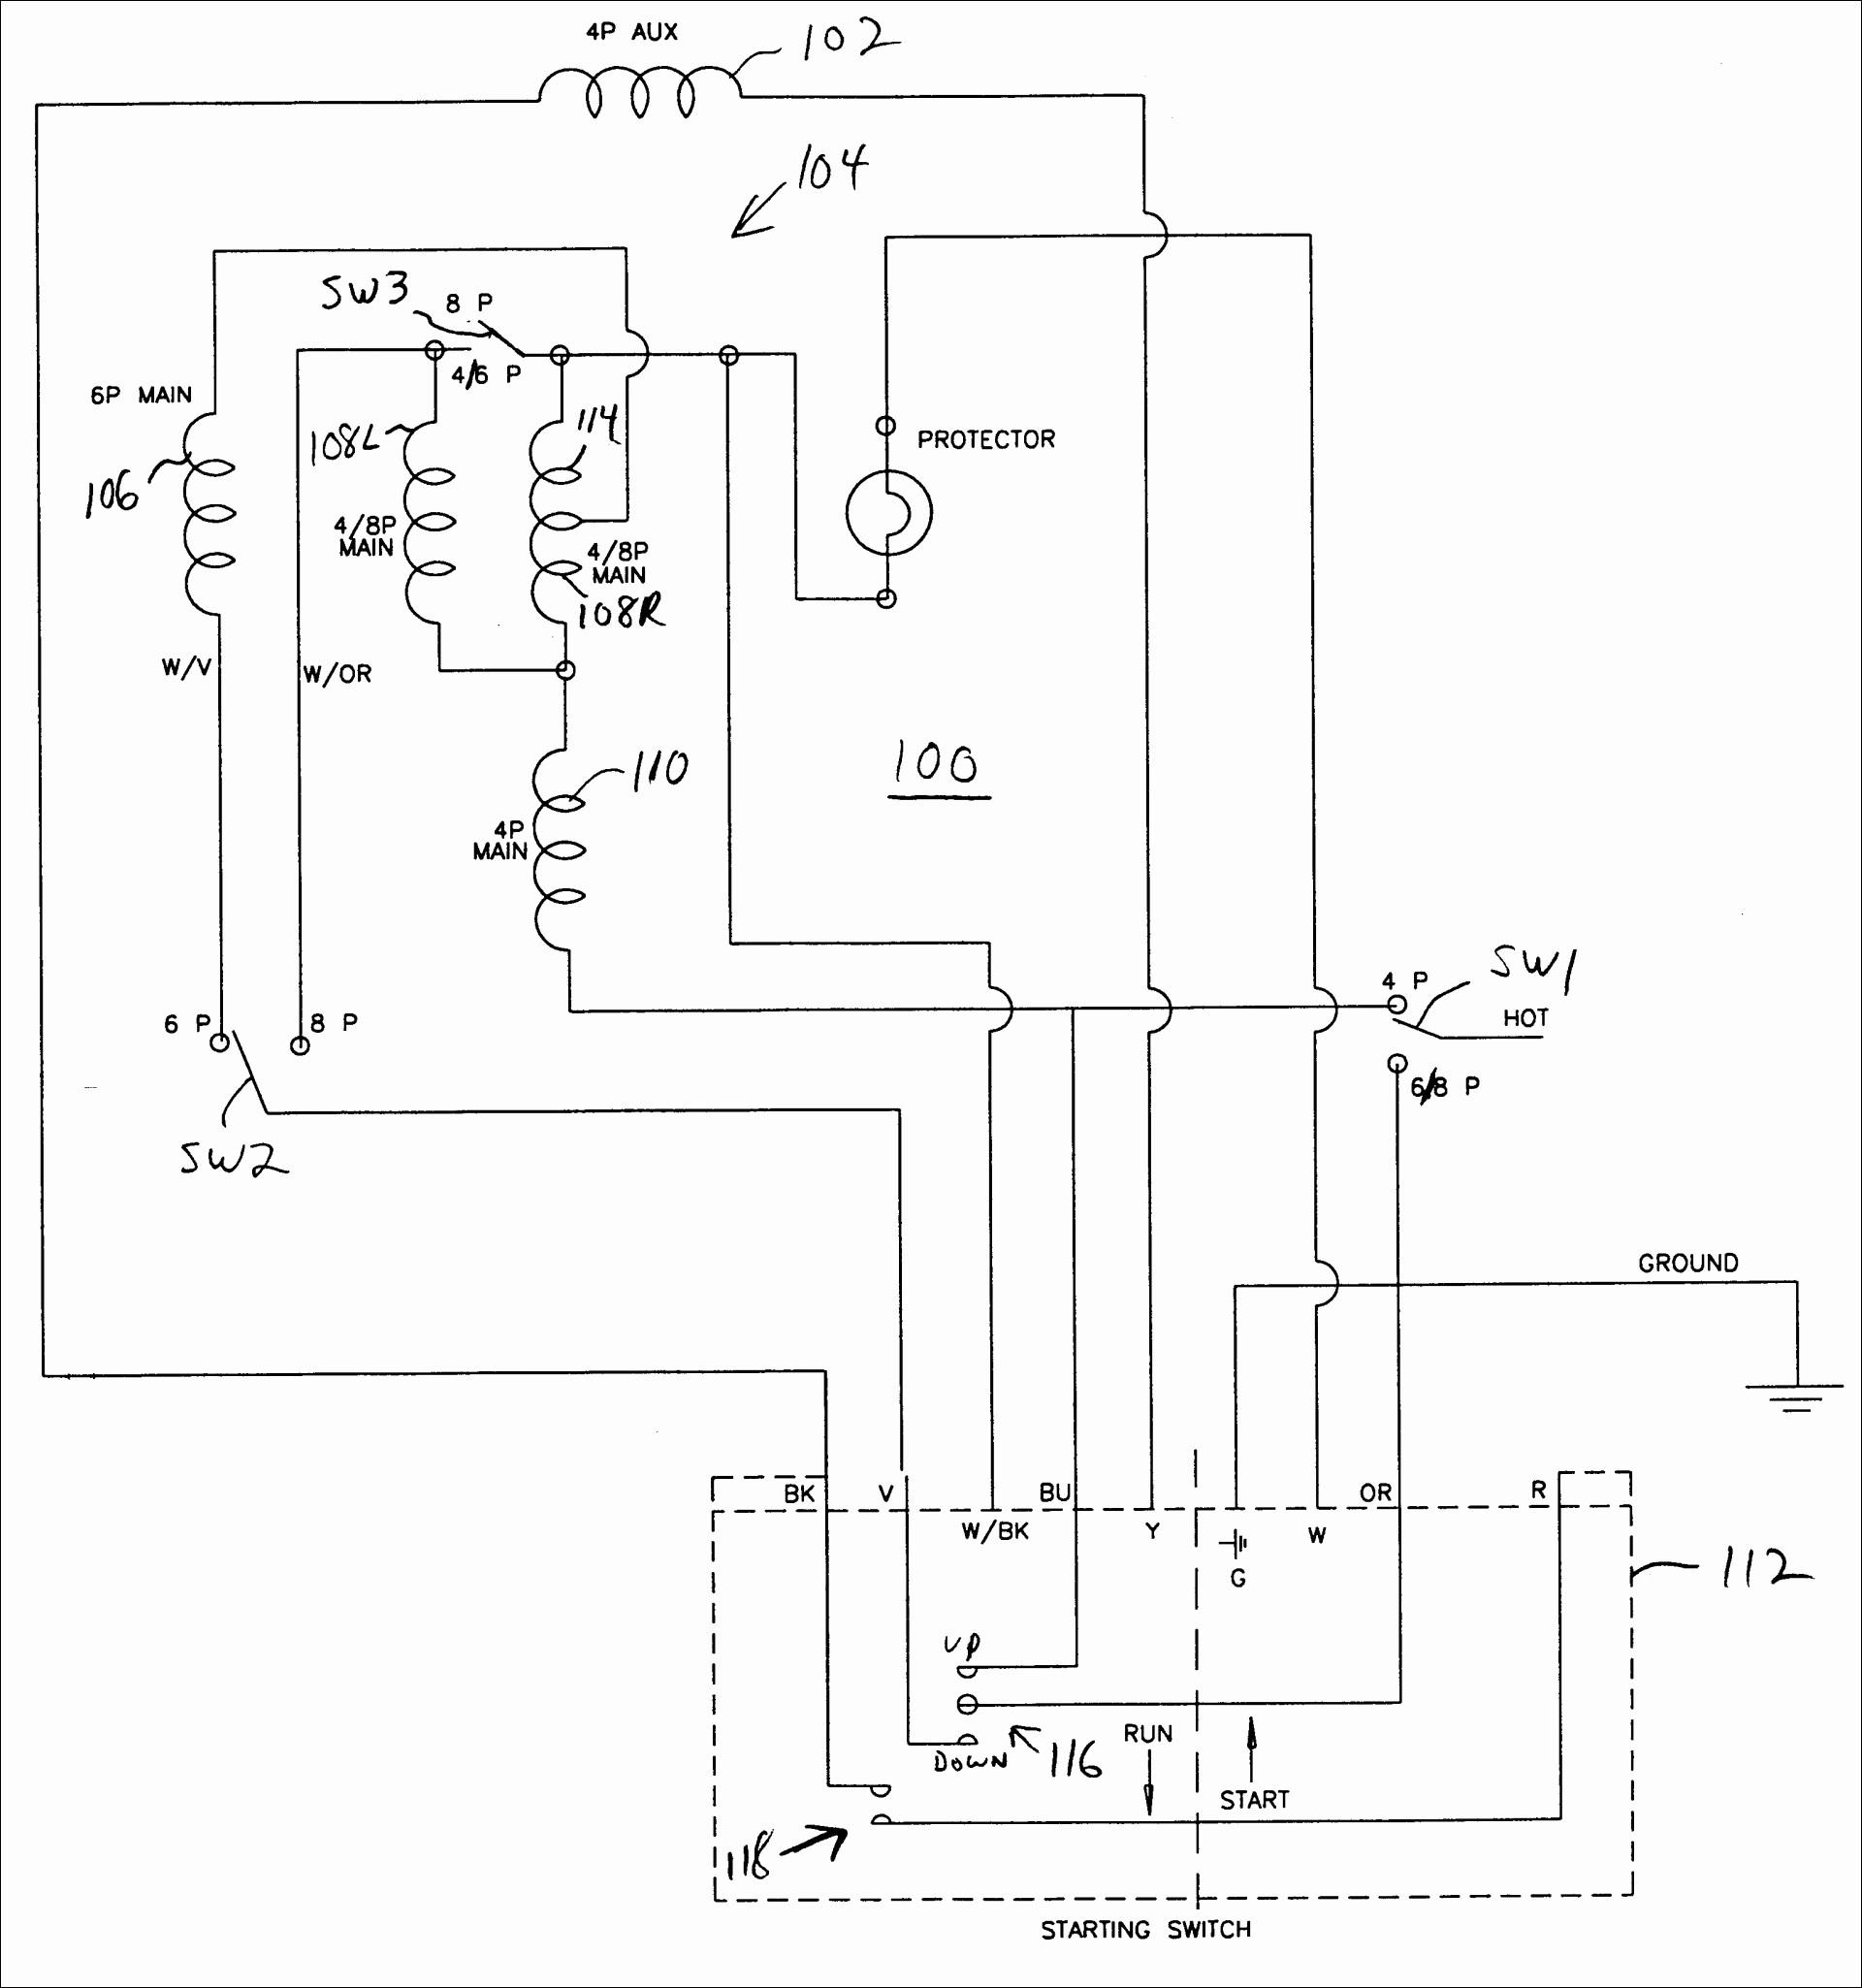 Gould Motor Wiring Diagram | Manual E-Books - Gould Century Motor Wiring Diagram